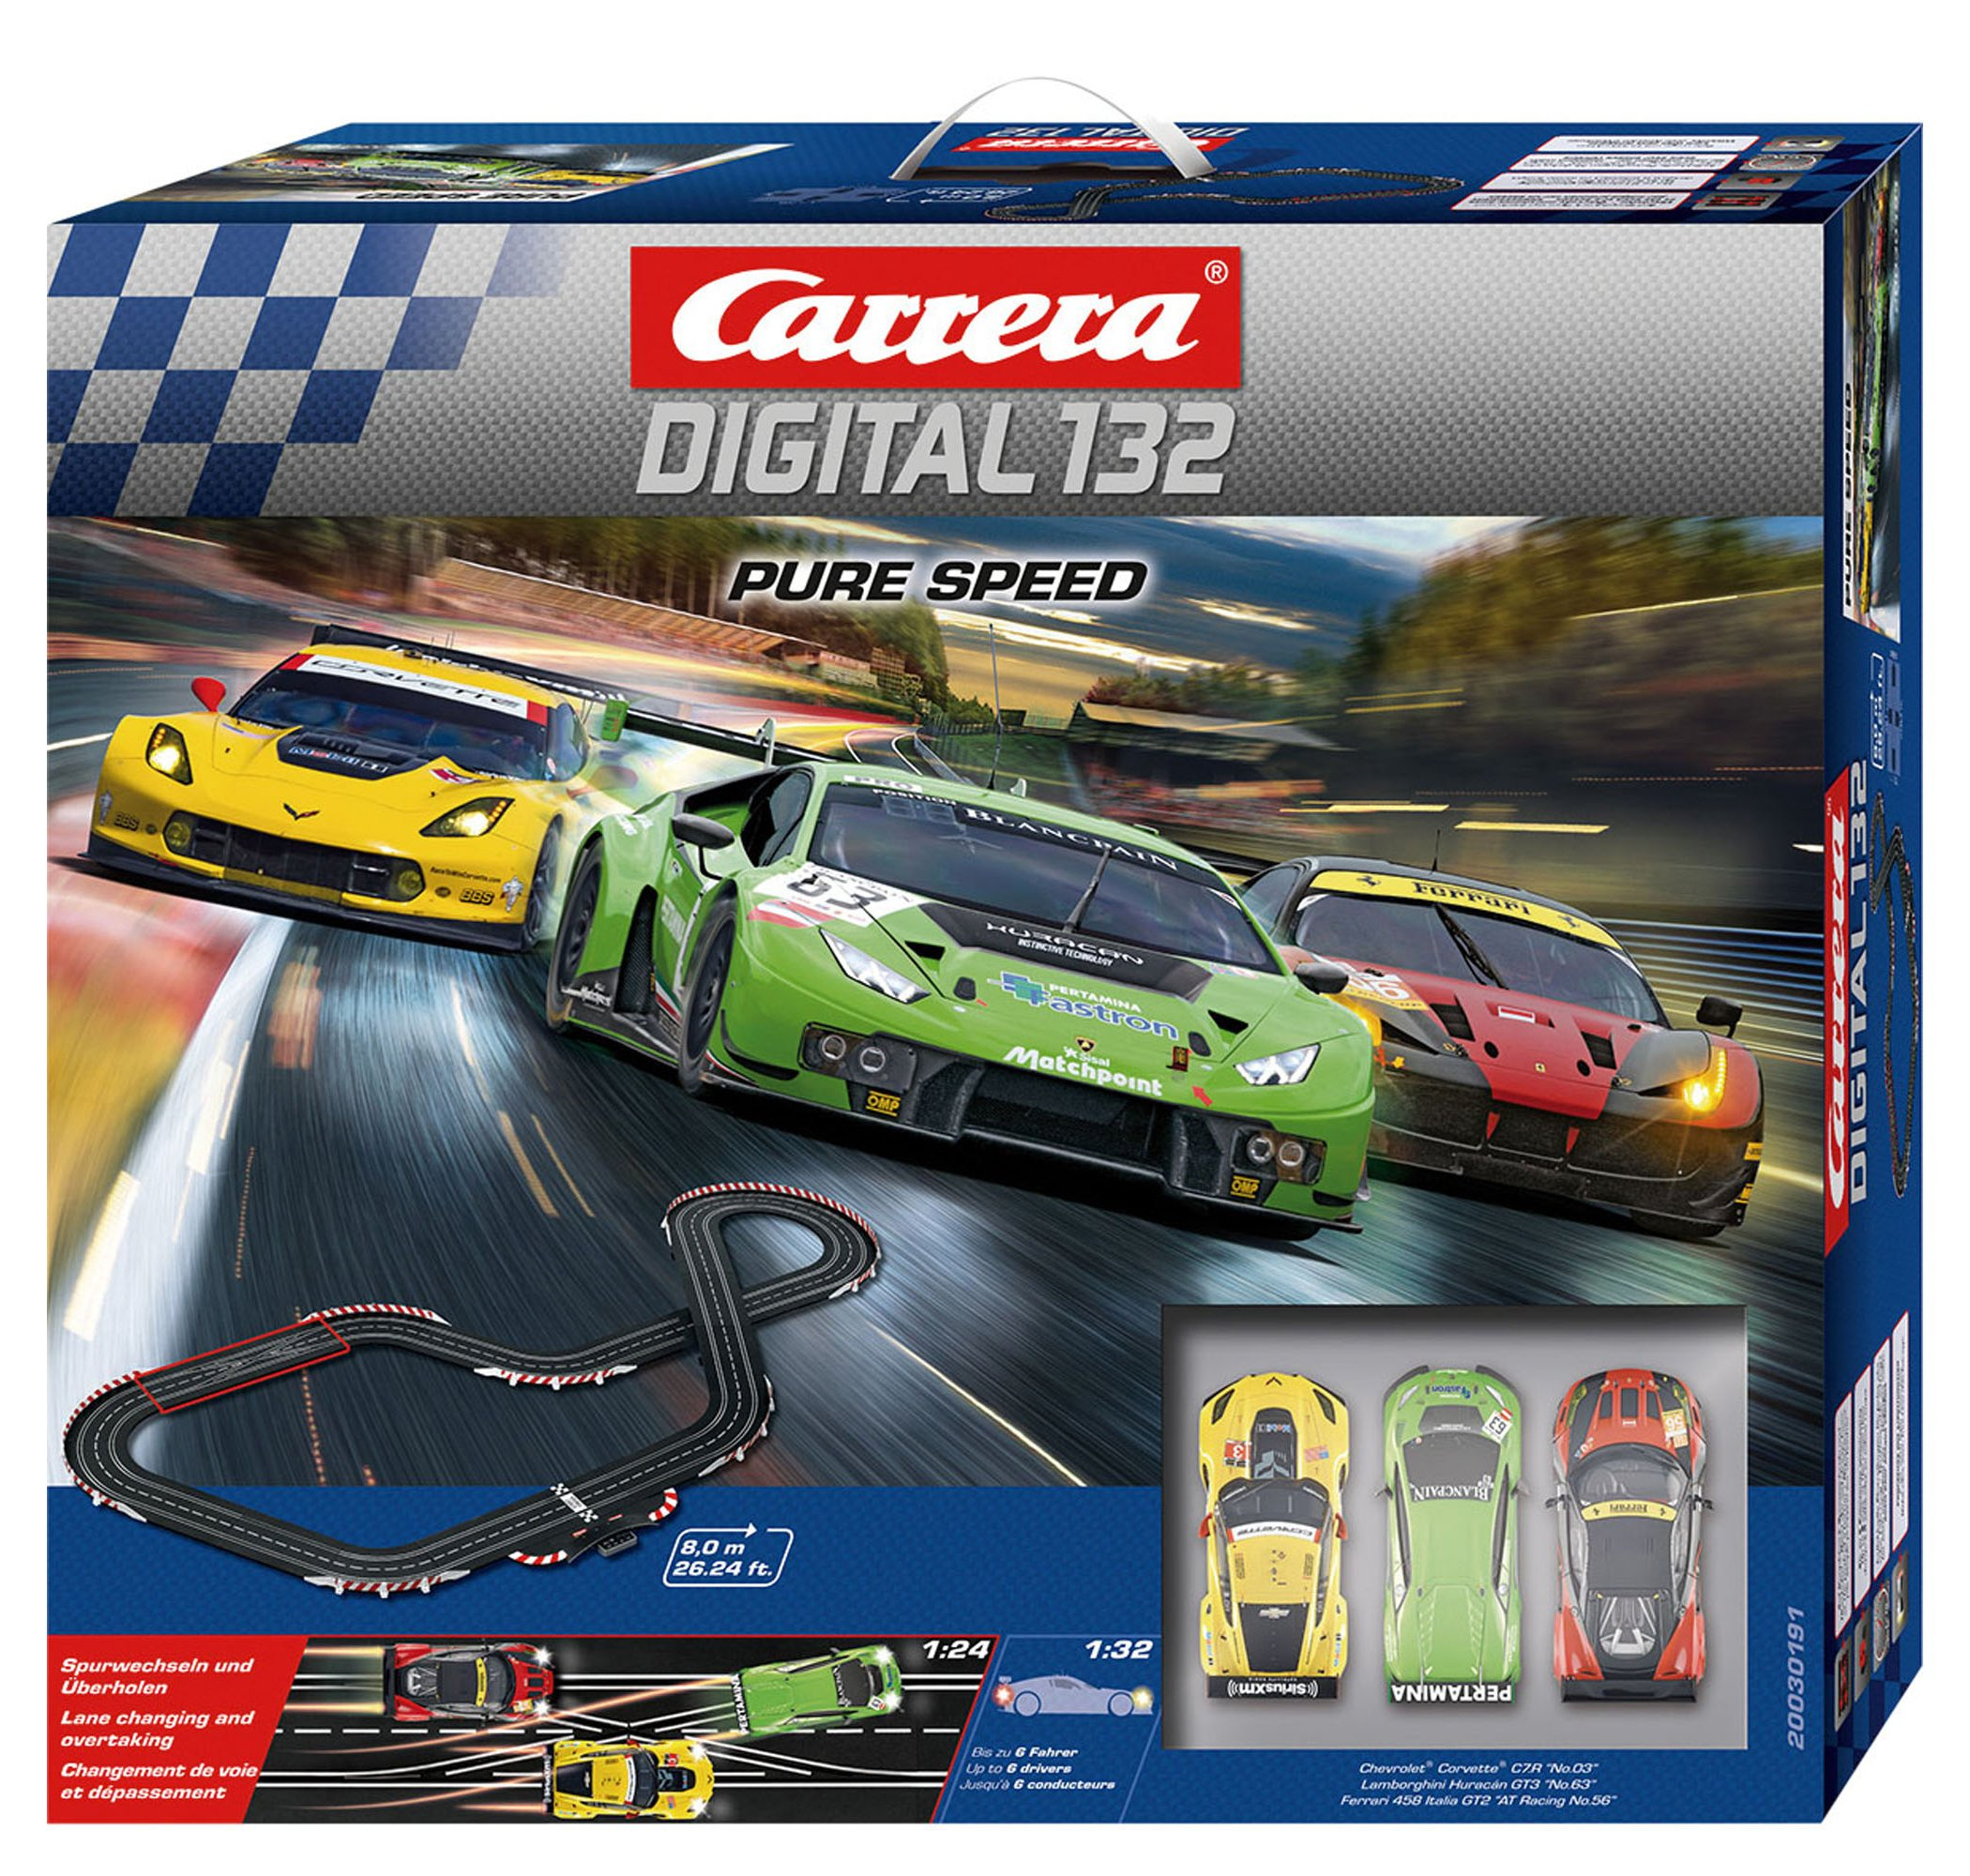 Carrera Digital 132 - Pure Speed Digital Racetrack System